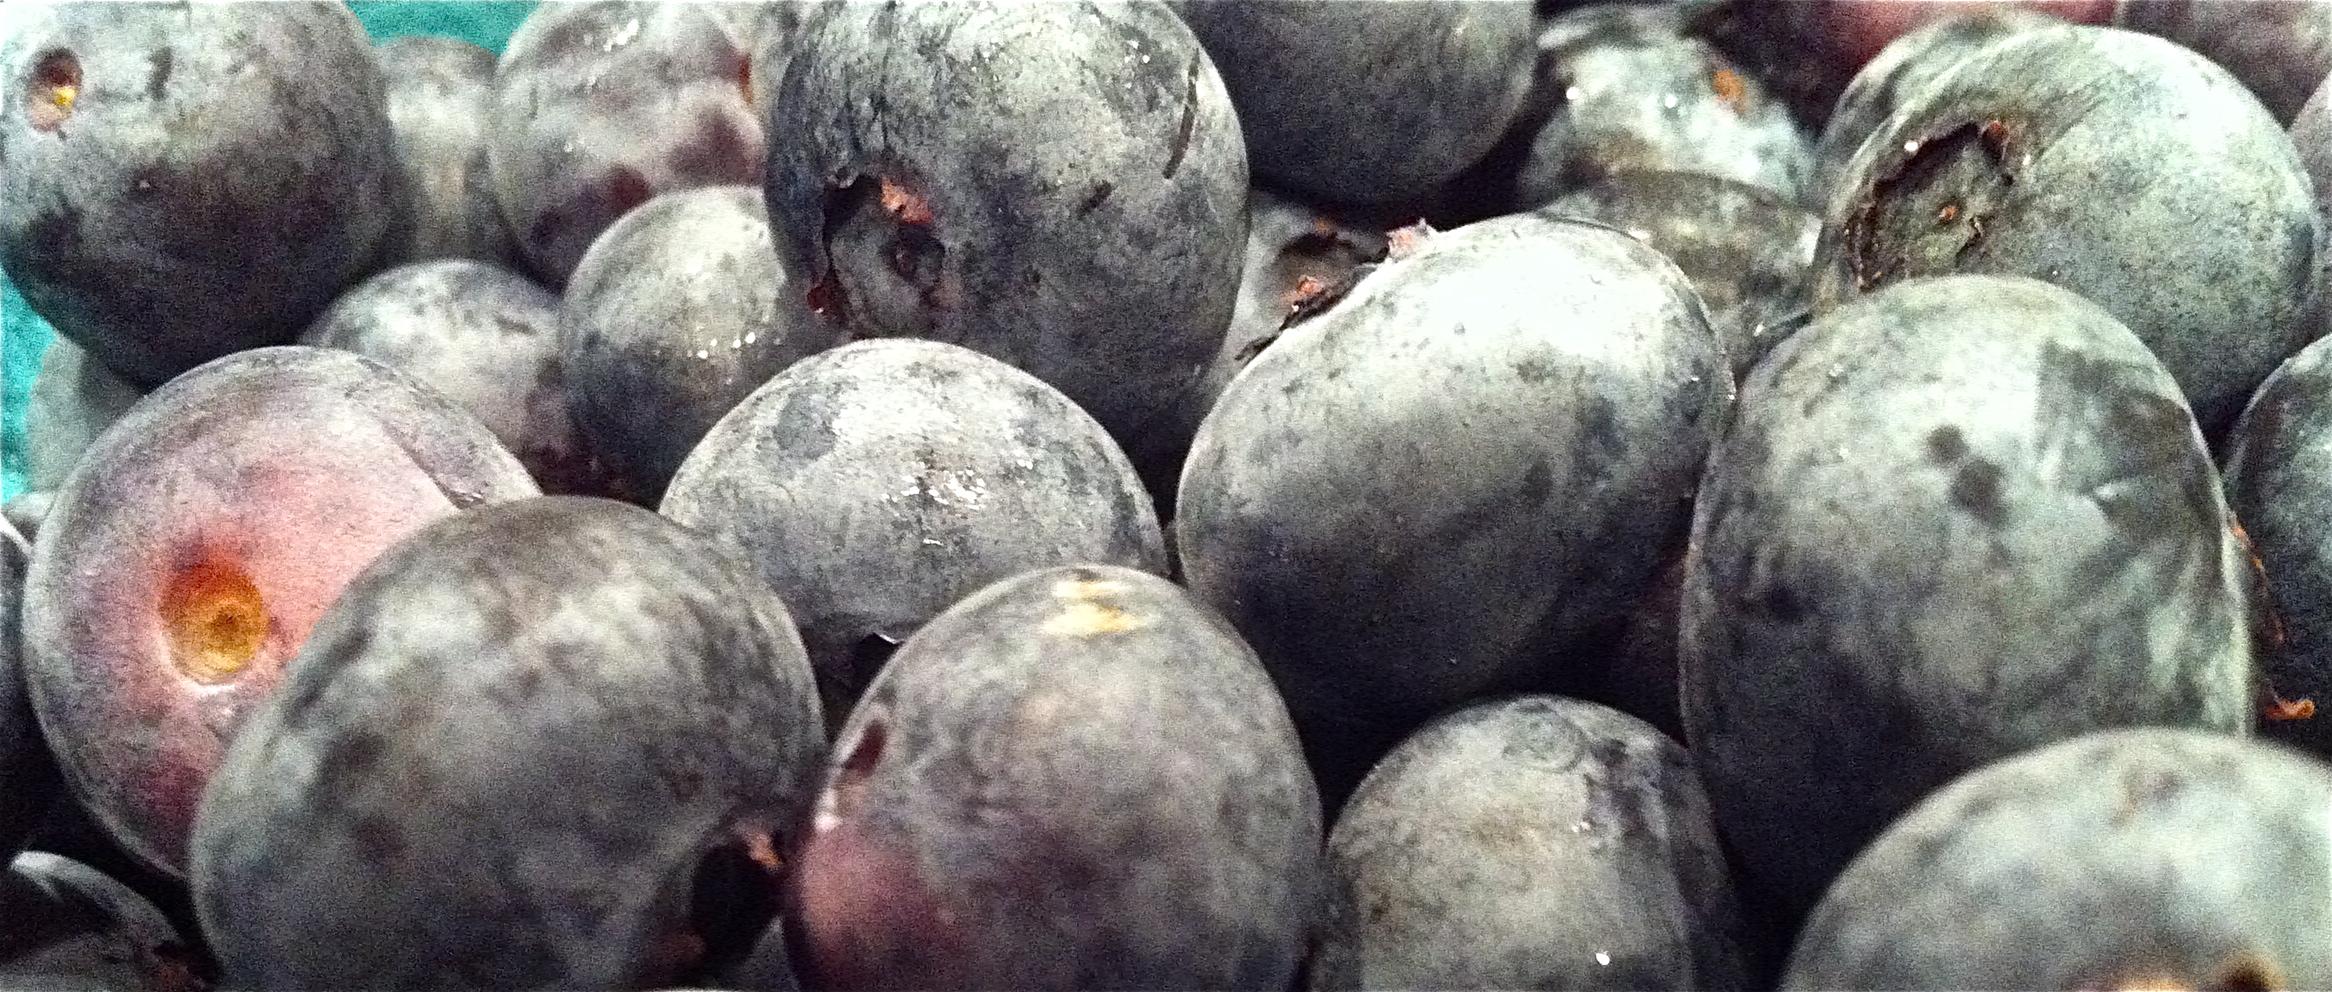 Frosty Blueberries